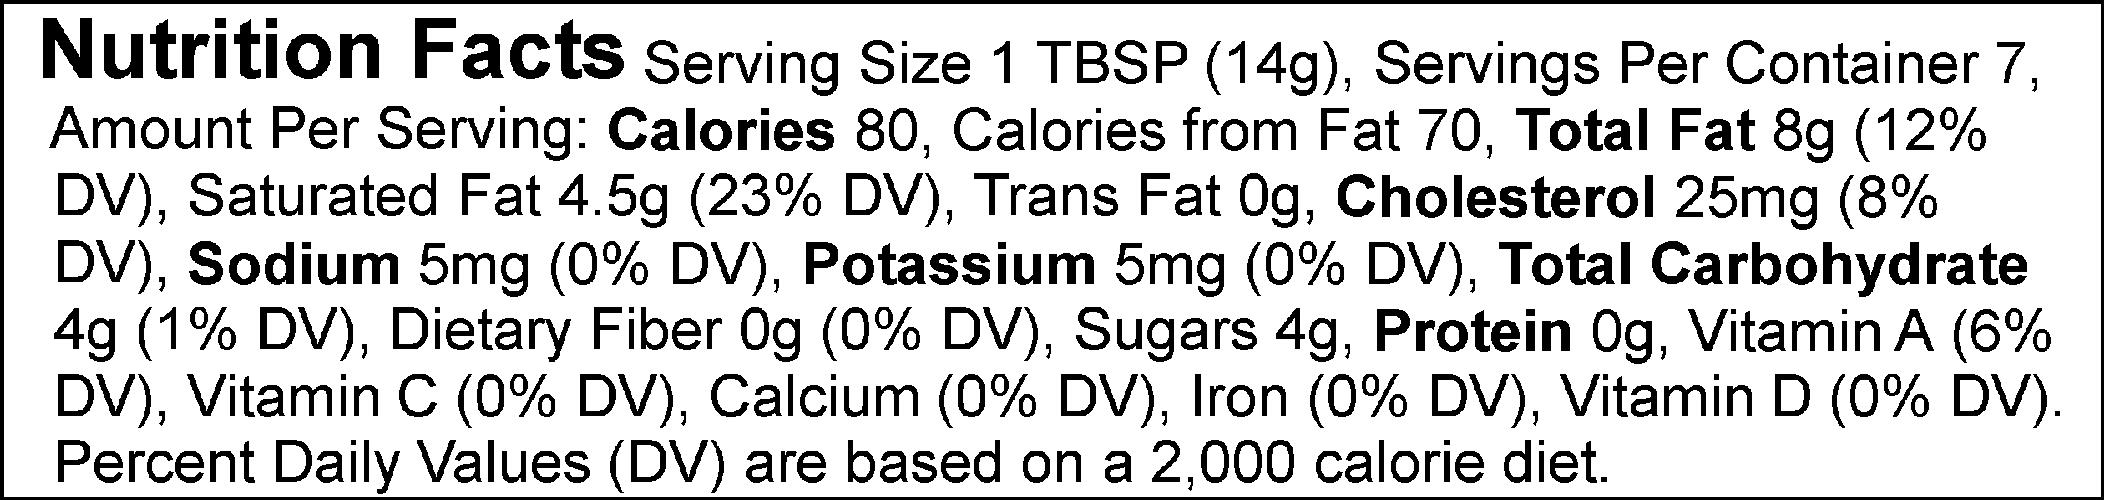 Nutrition facts for Epicurean Butter's Cinnamon & Brown Sugar